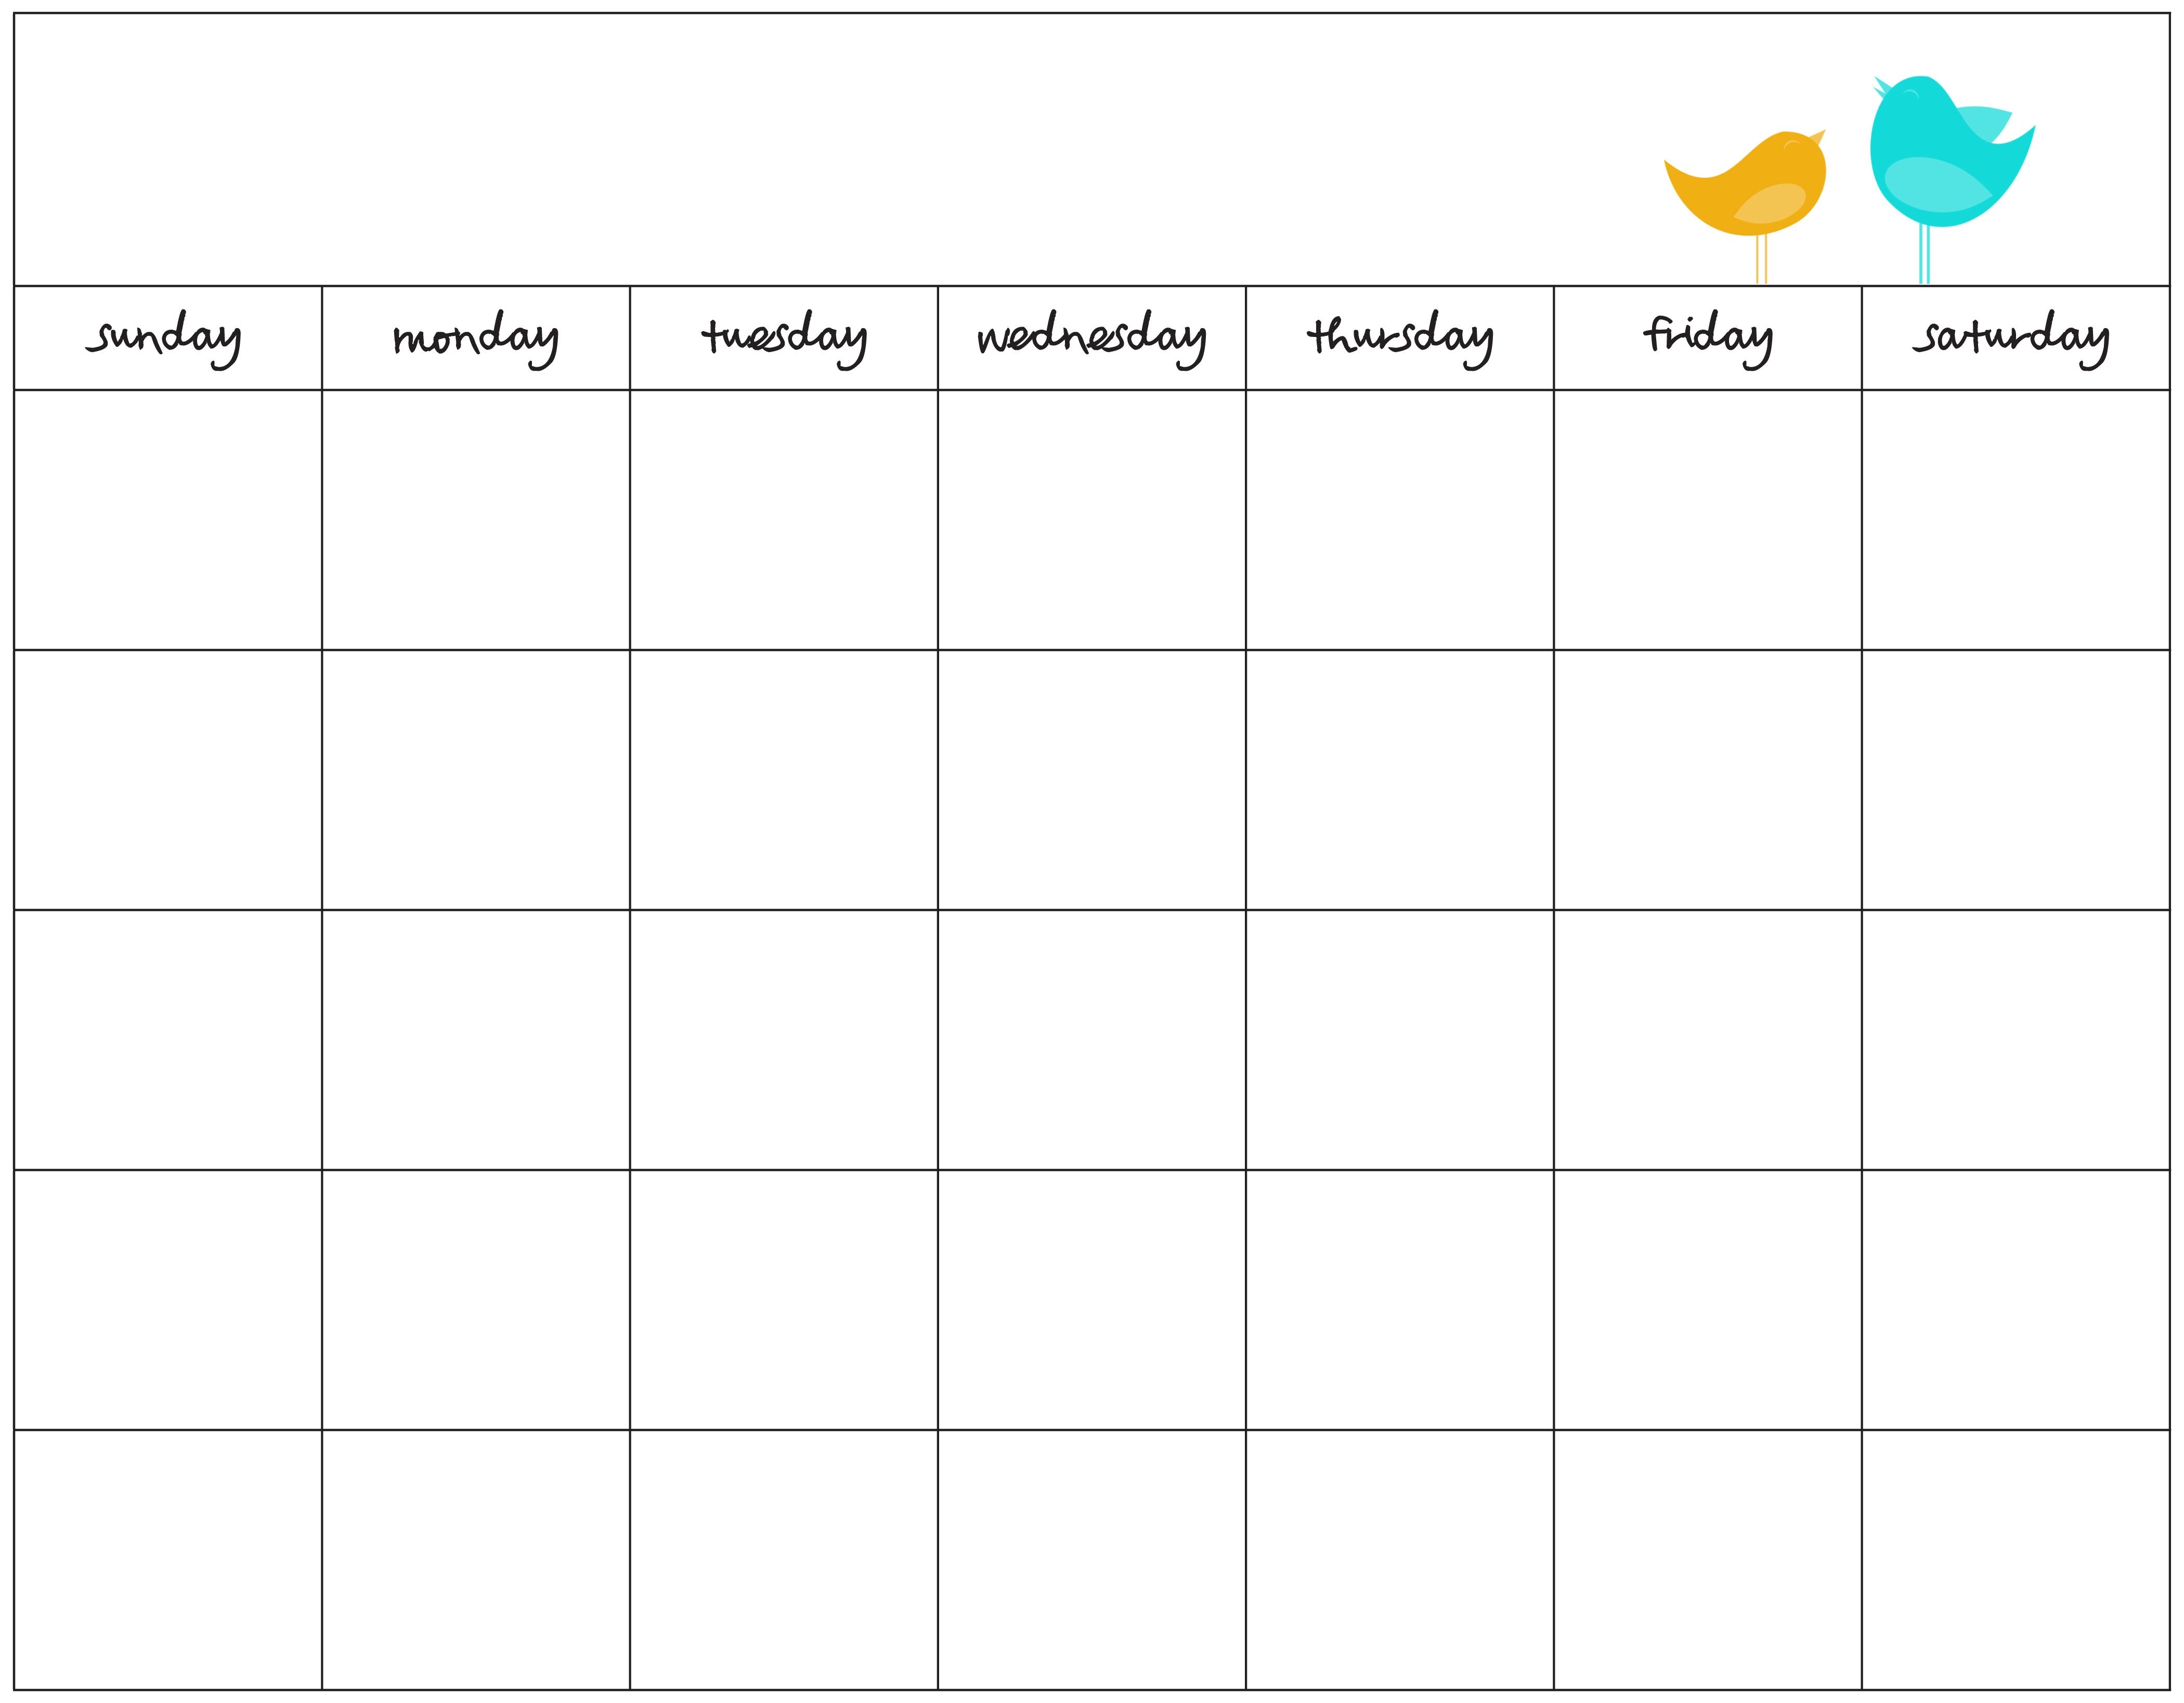 Calendars Free Print Commonpenceco